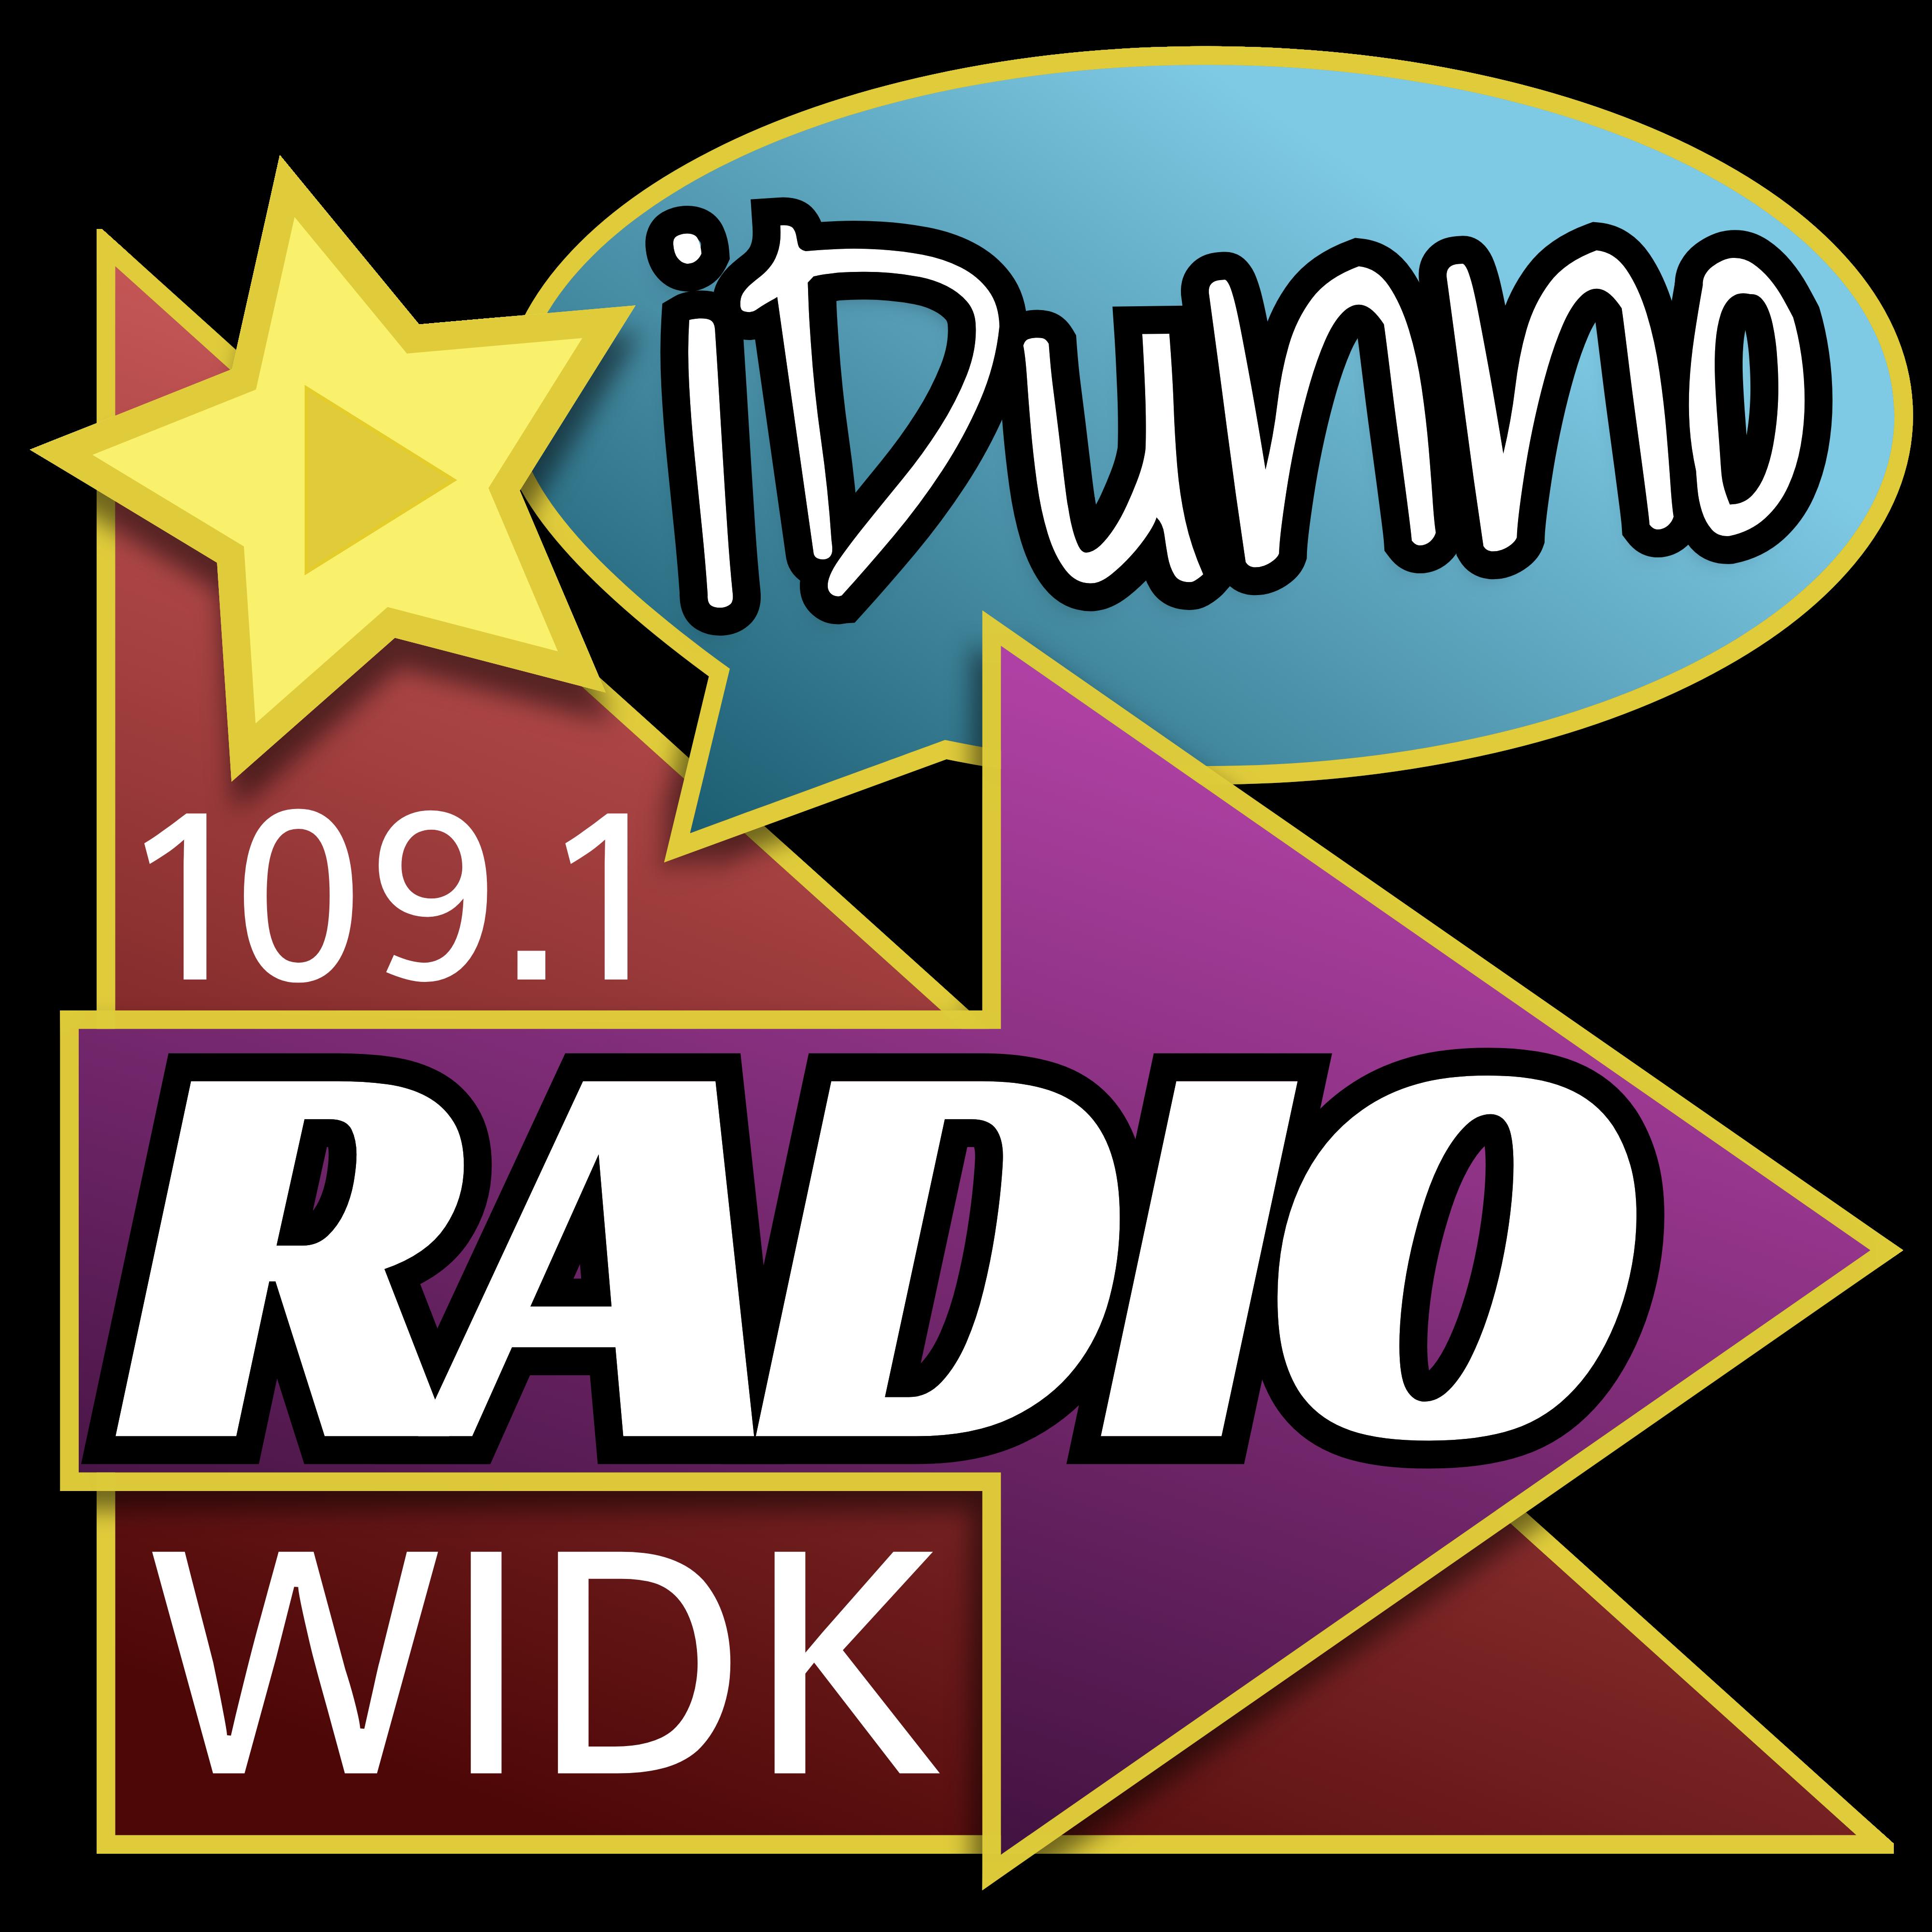 iDunnoRadio - 109.1 WIDK